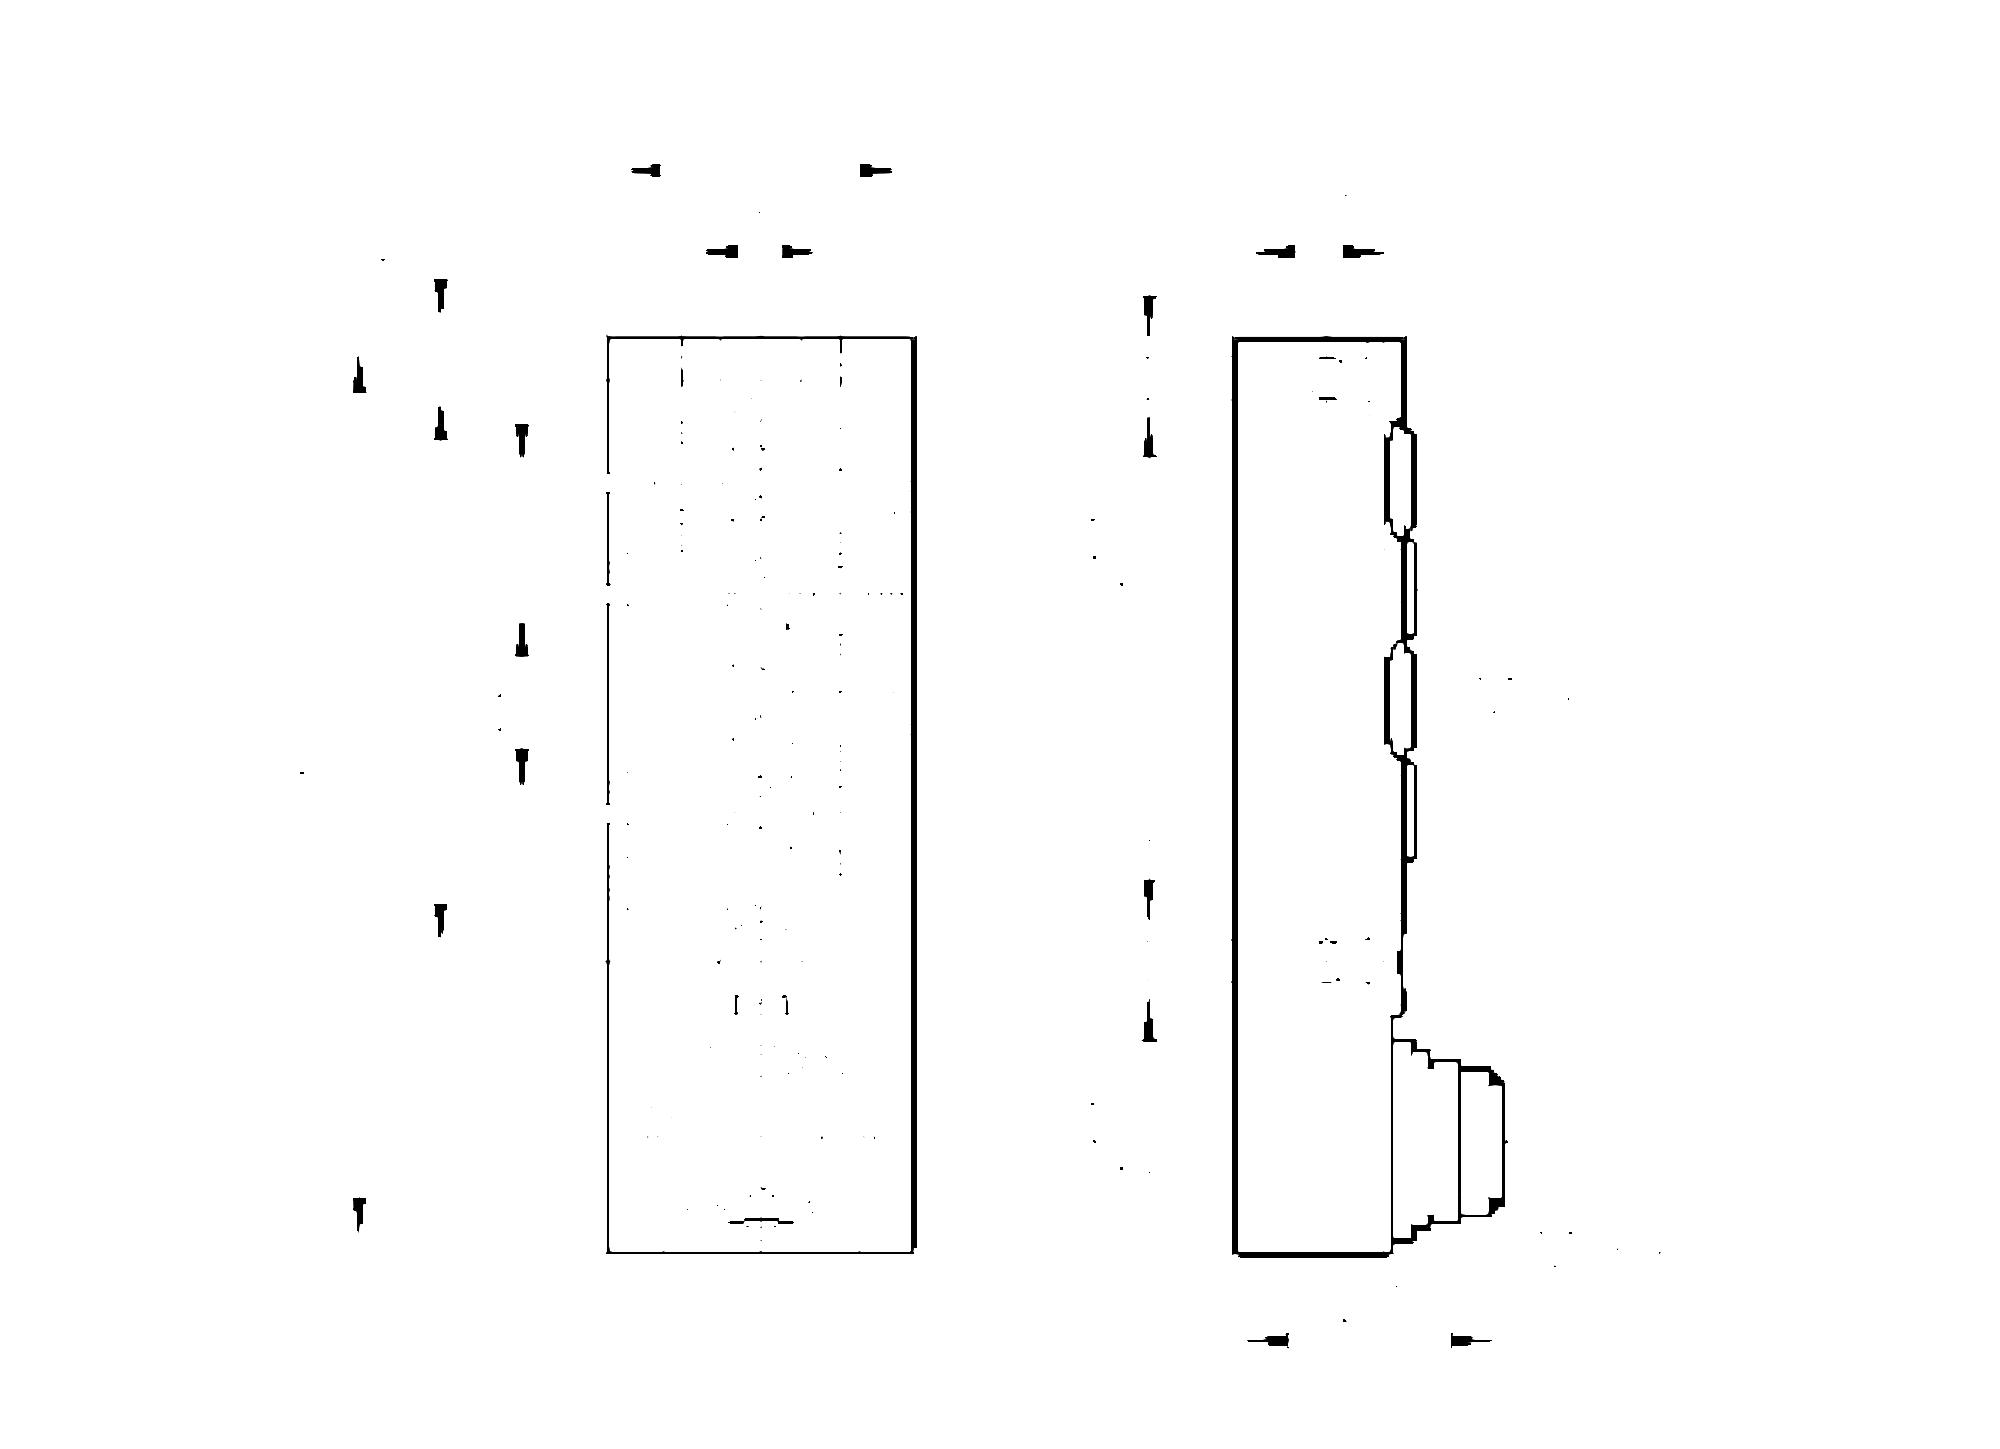 ebc063 - wiring block